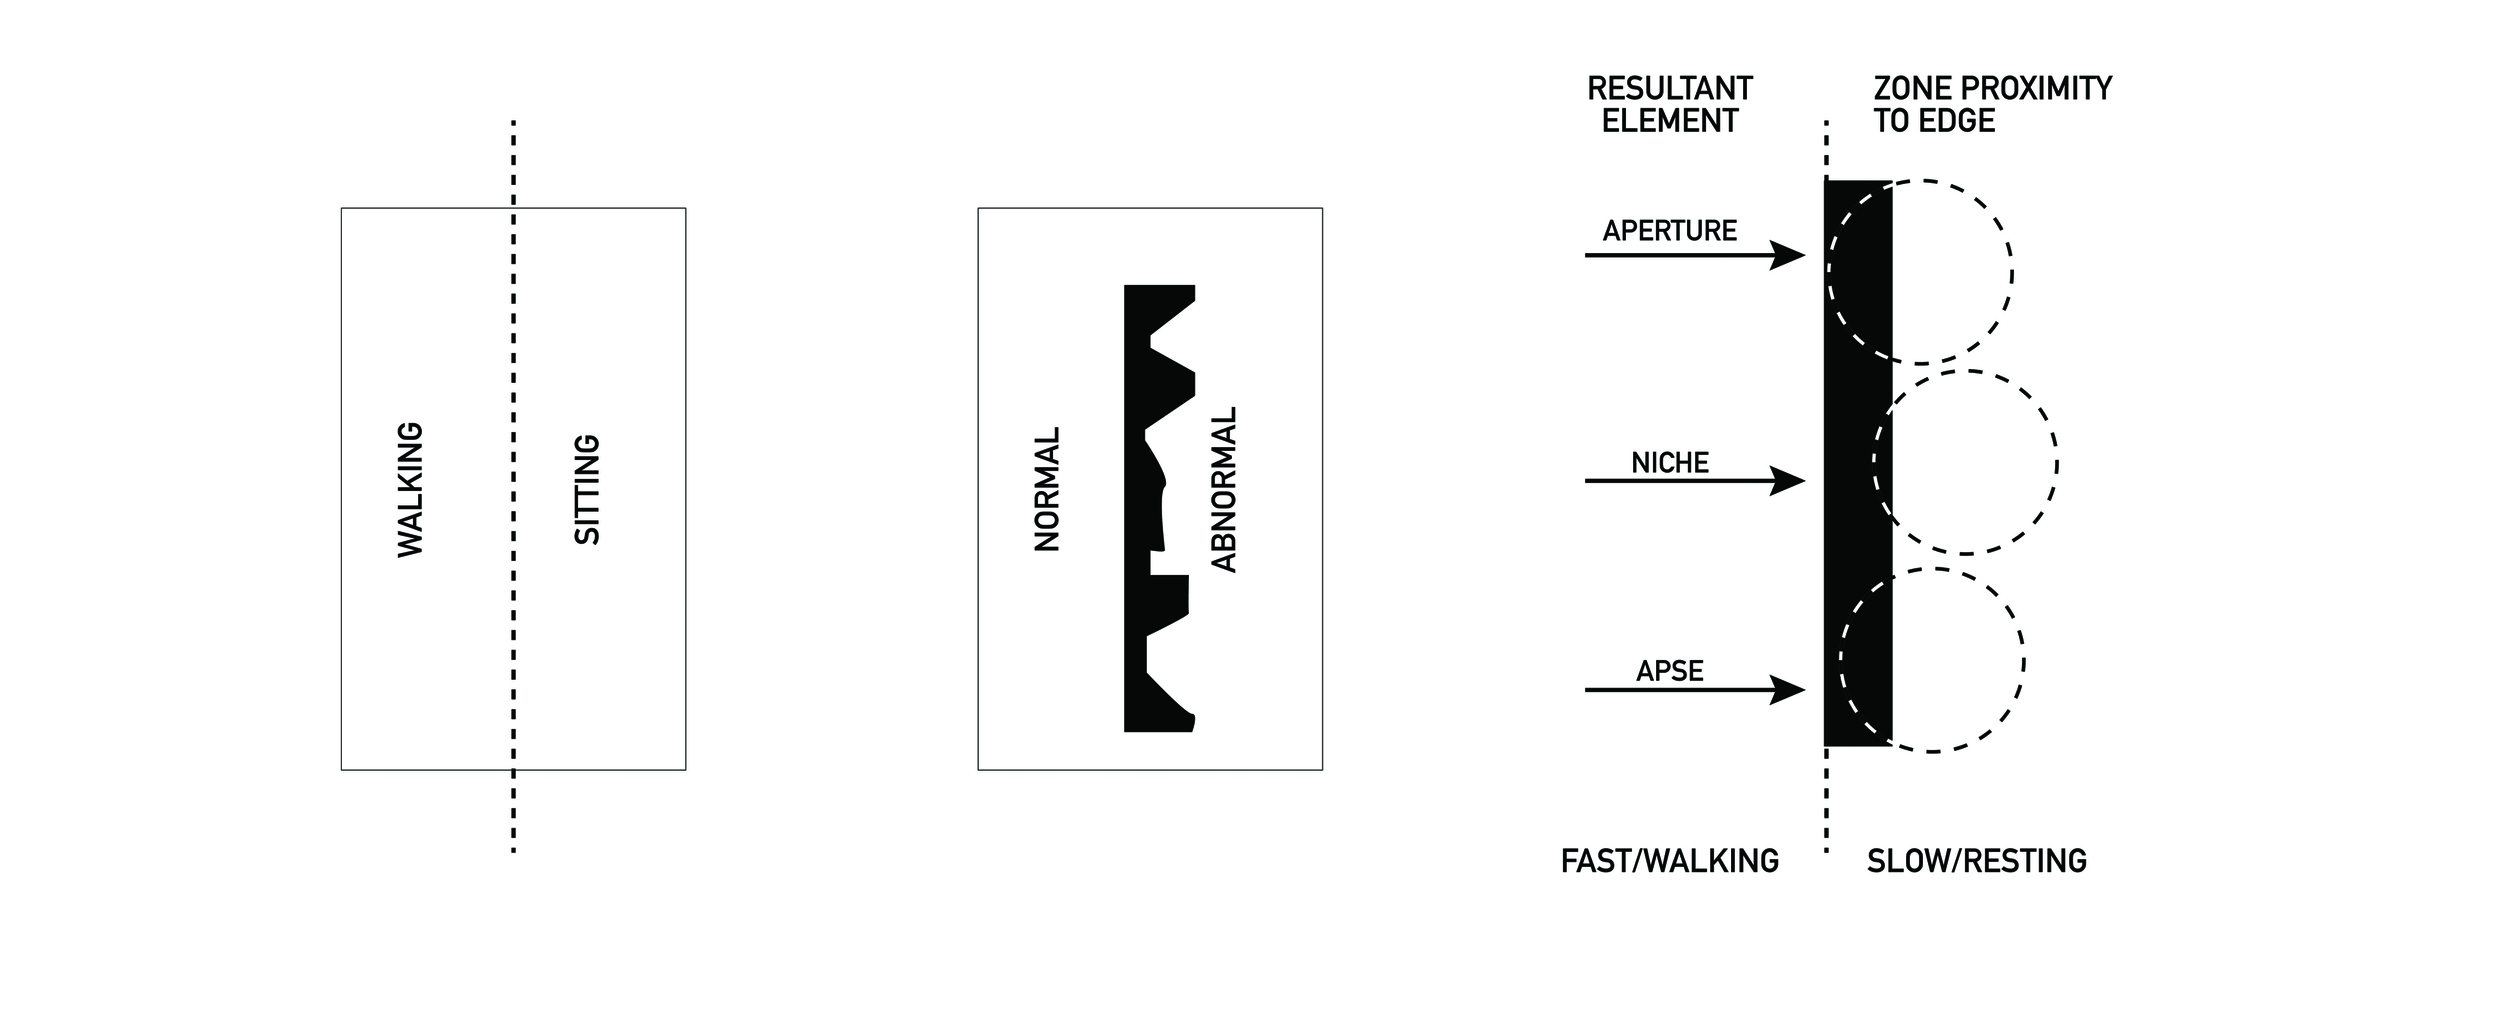 Wall-E_Diagram.jpg